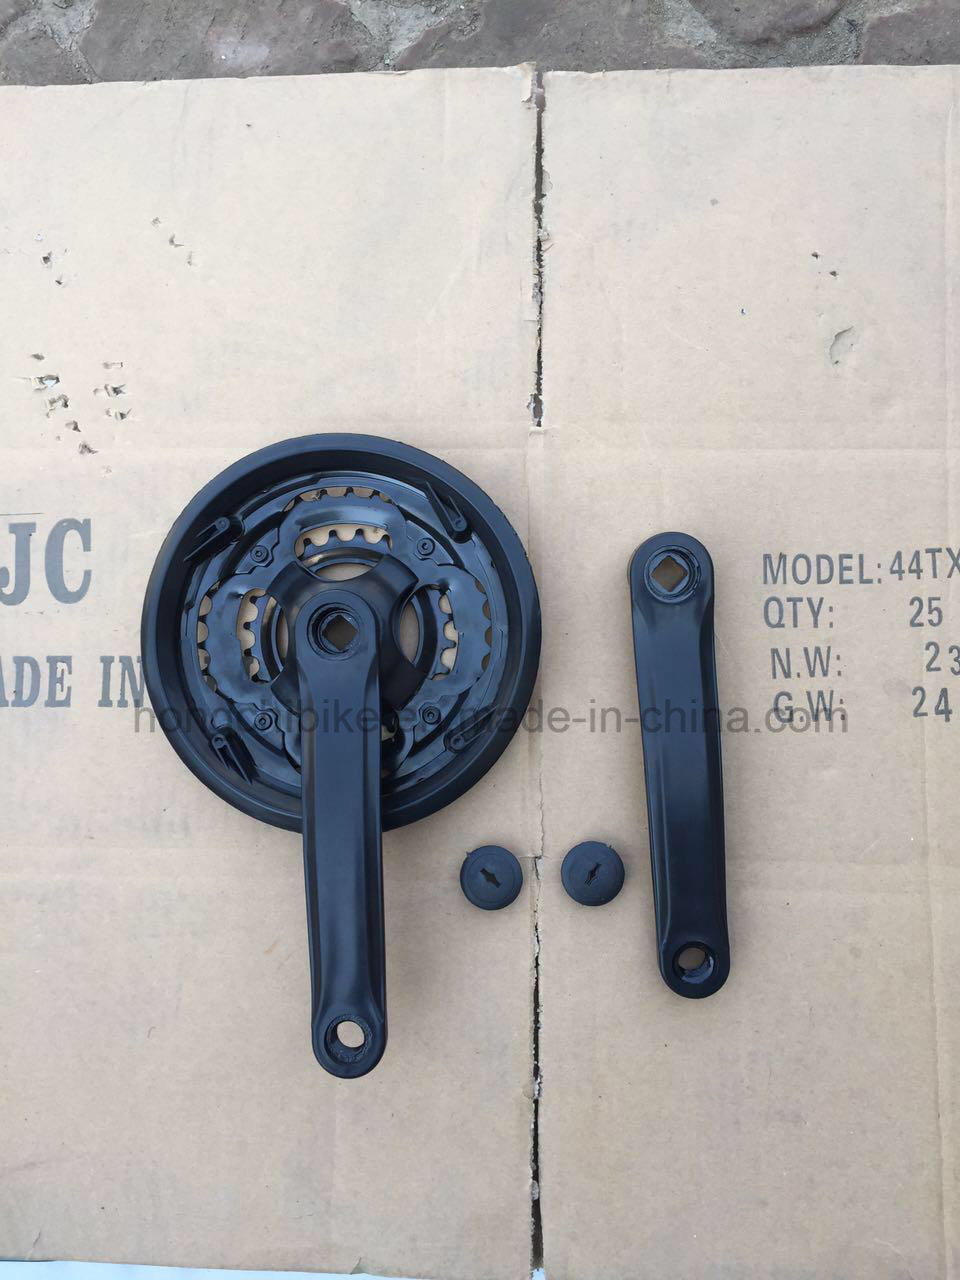 Chainwheel&Crank MTB Crank Bicycle Spare Parts Steel Crank Alloy Crank